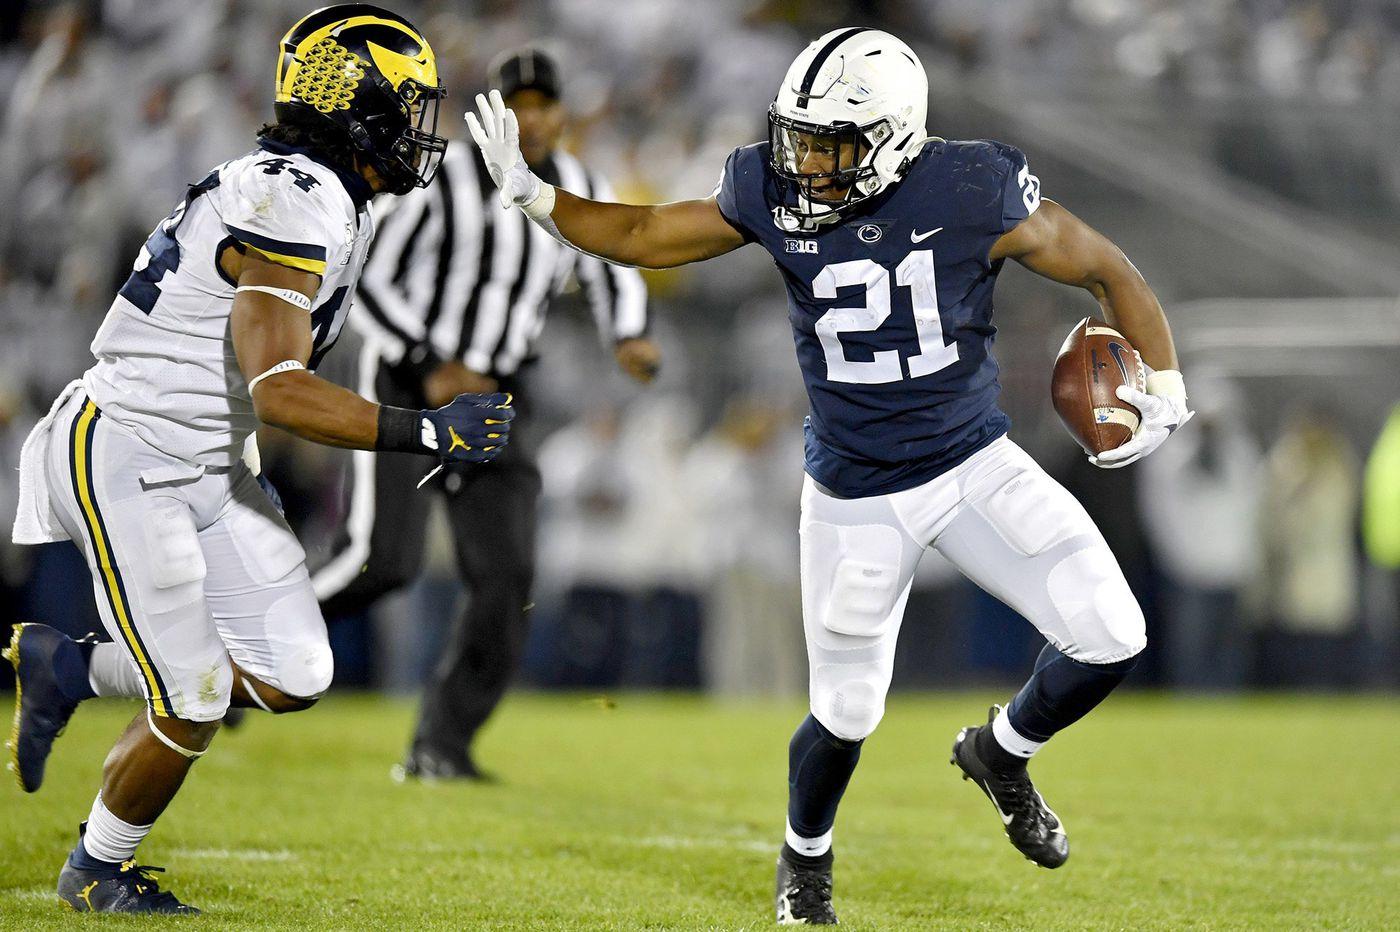 Cotton Bowl, Penn State vs. Memphis: Our predictions